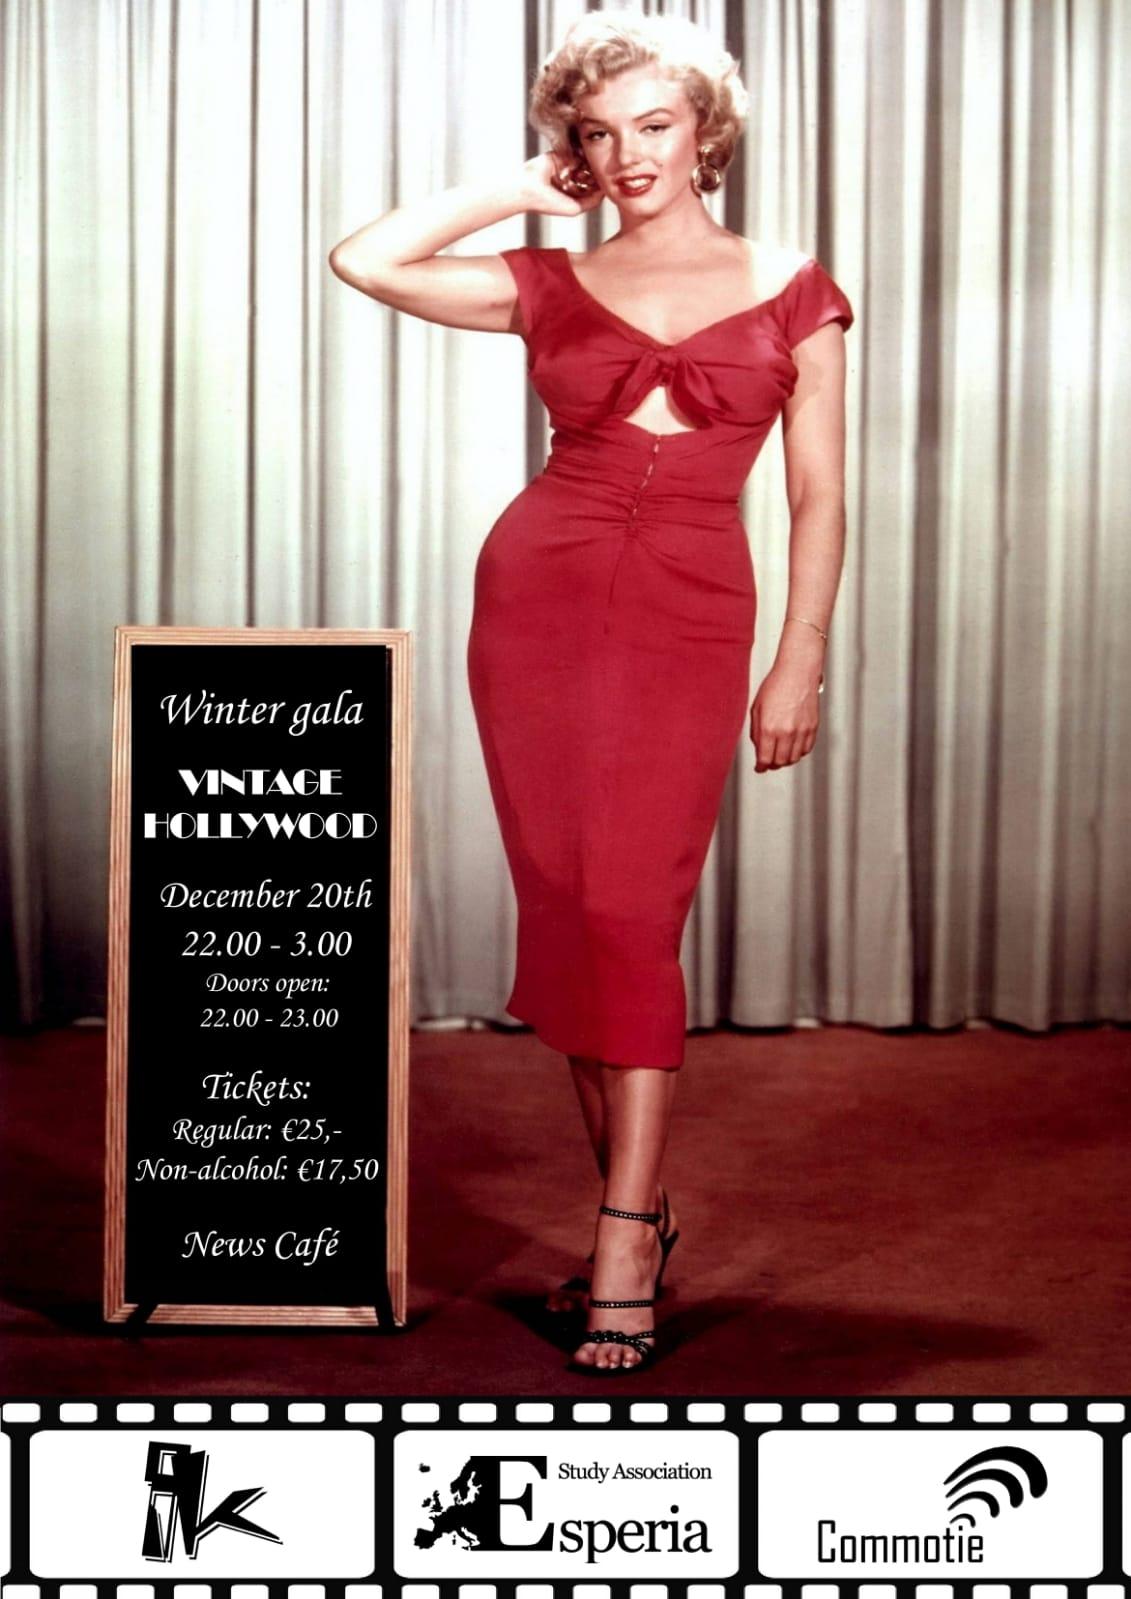 Gala: Vintage Hollywood